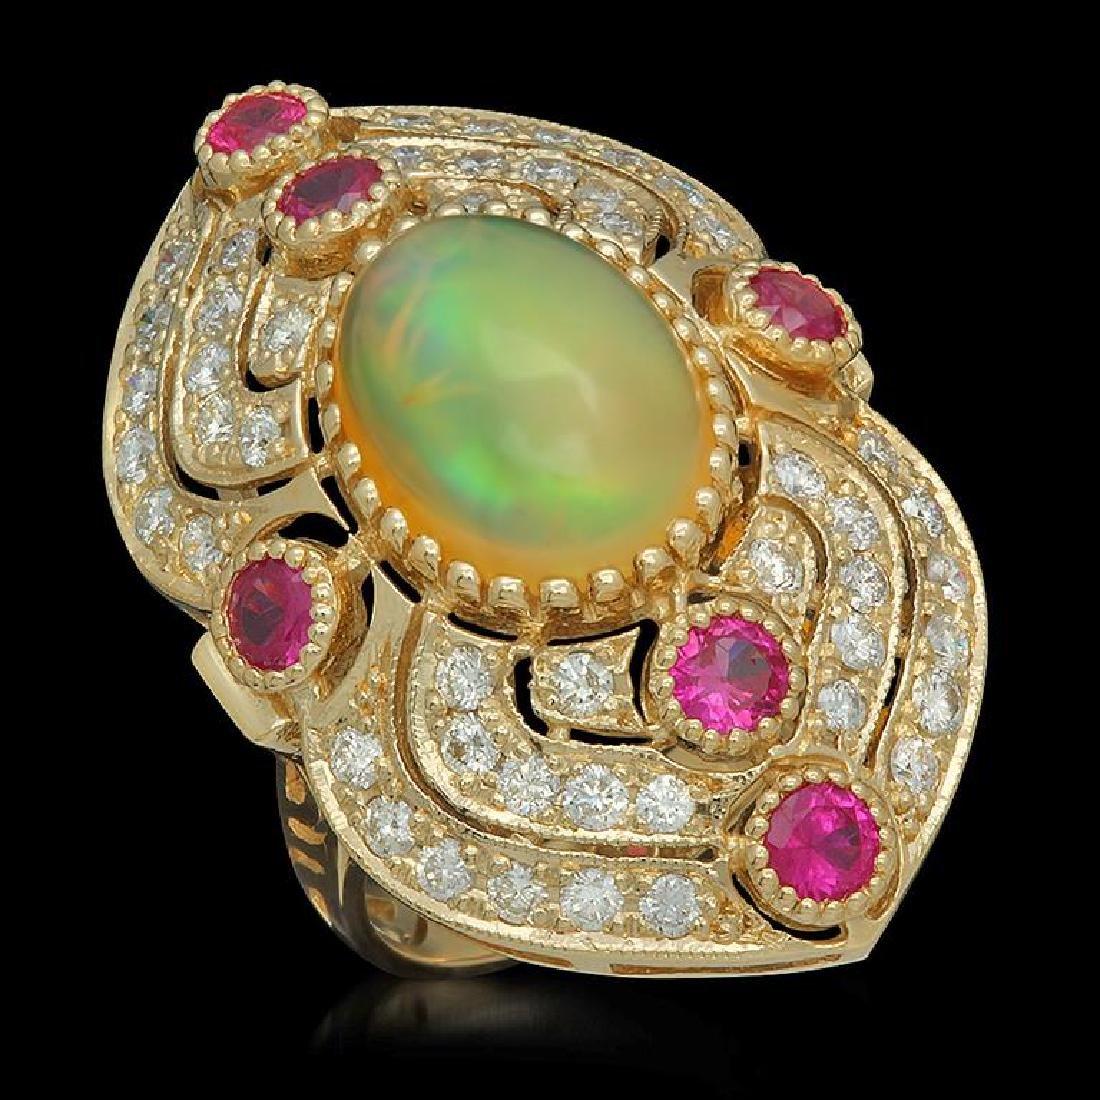 14K Gold 3.60ct Opal, 1.20ct Ruby & 1.51ct Diamond Ring